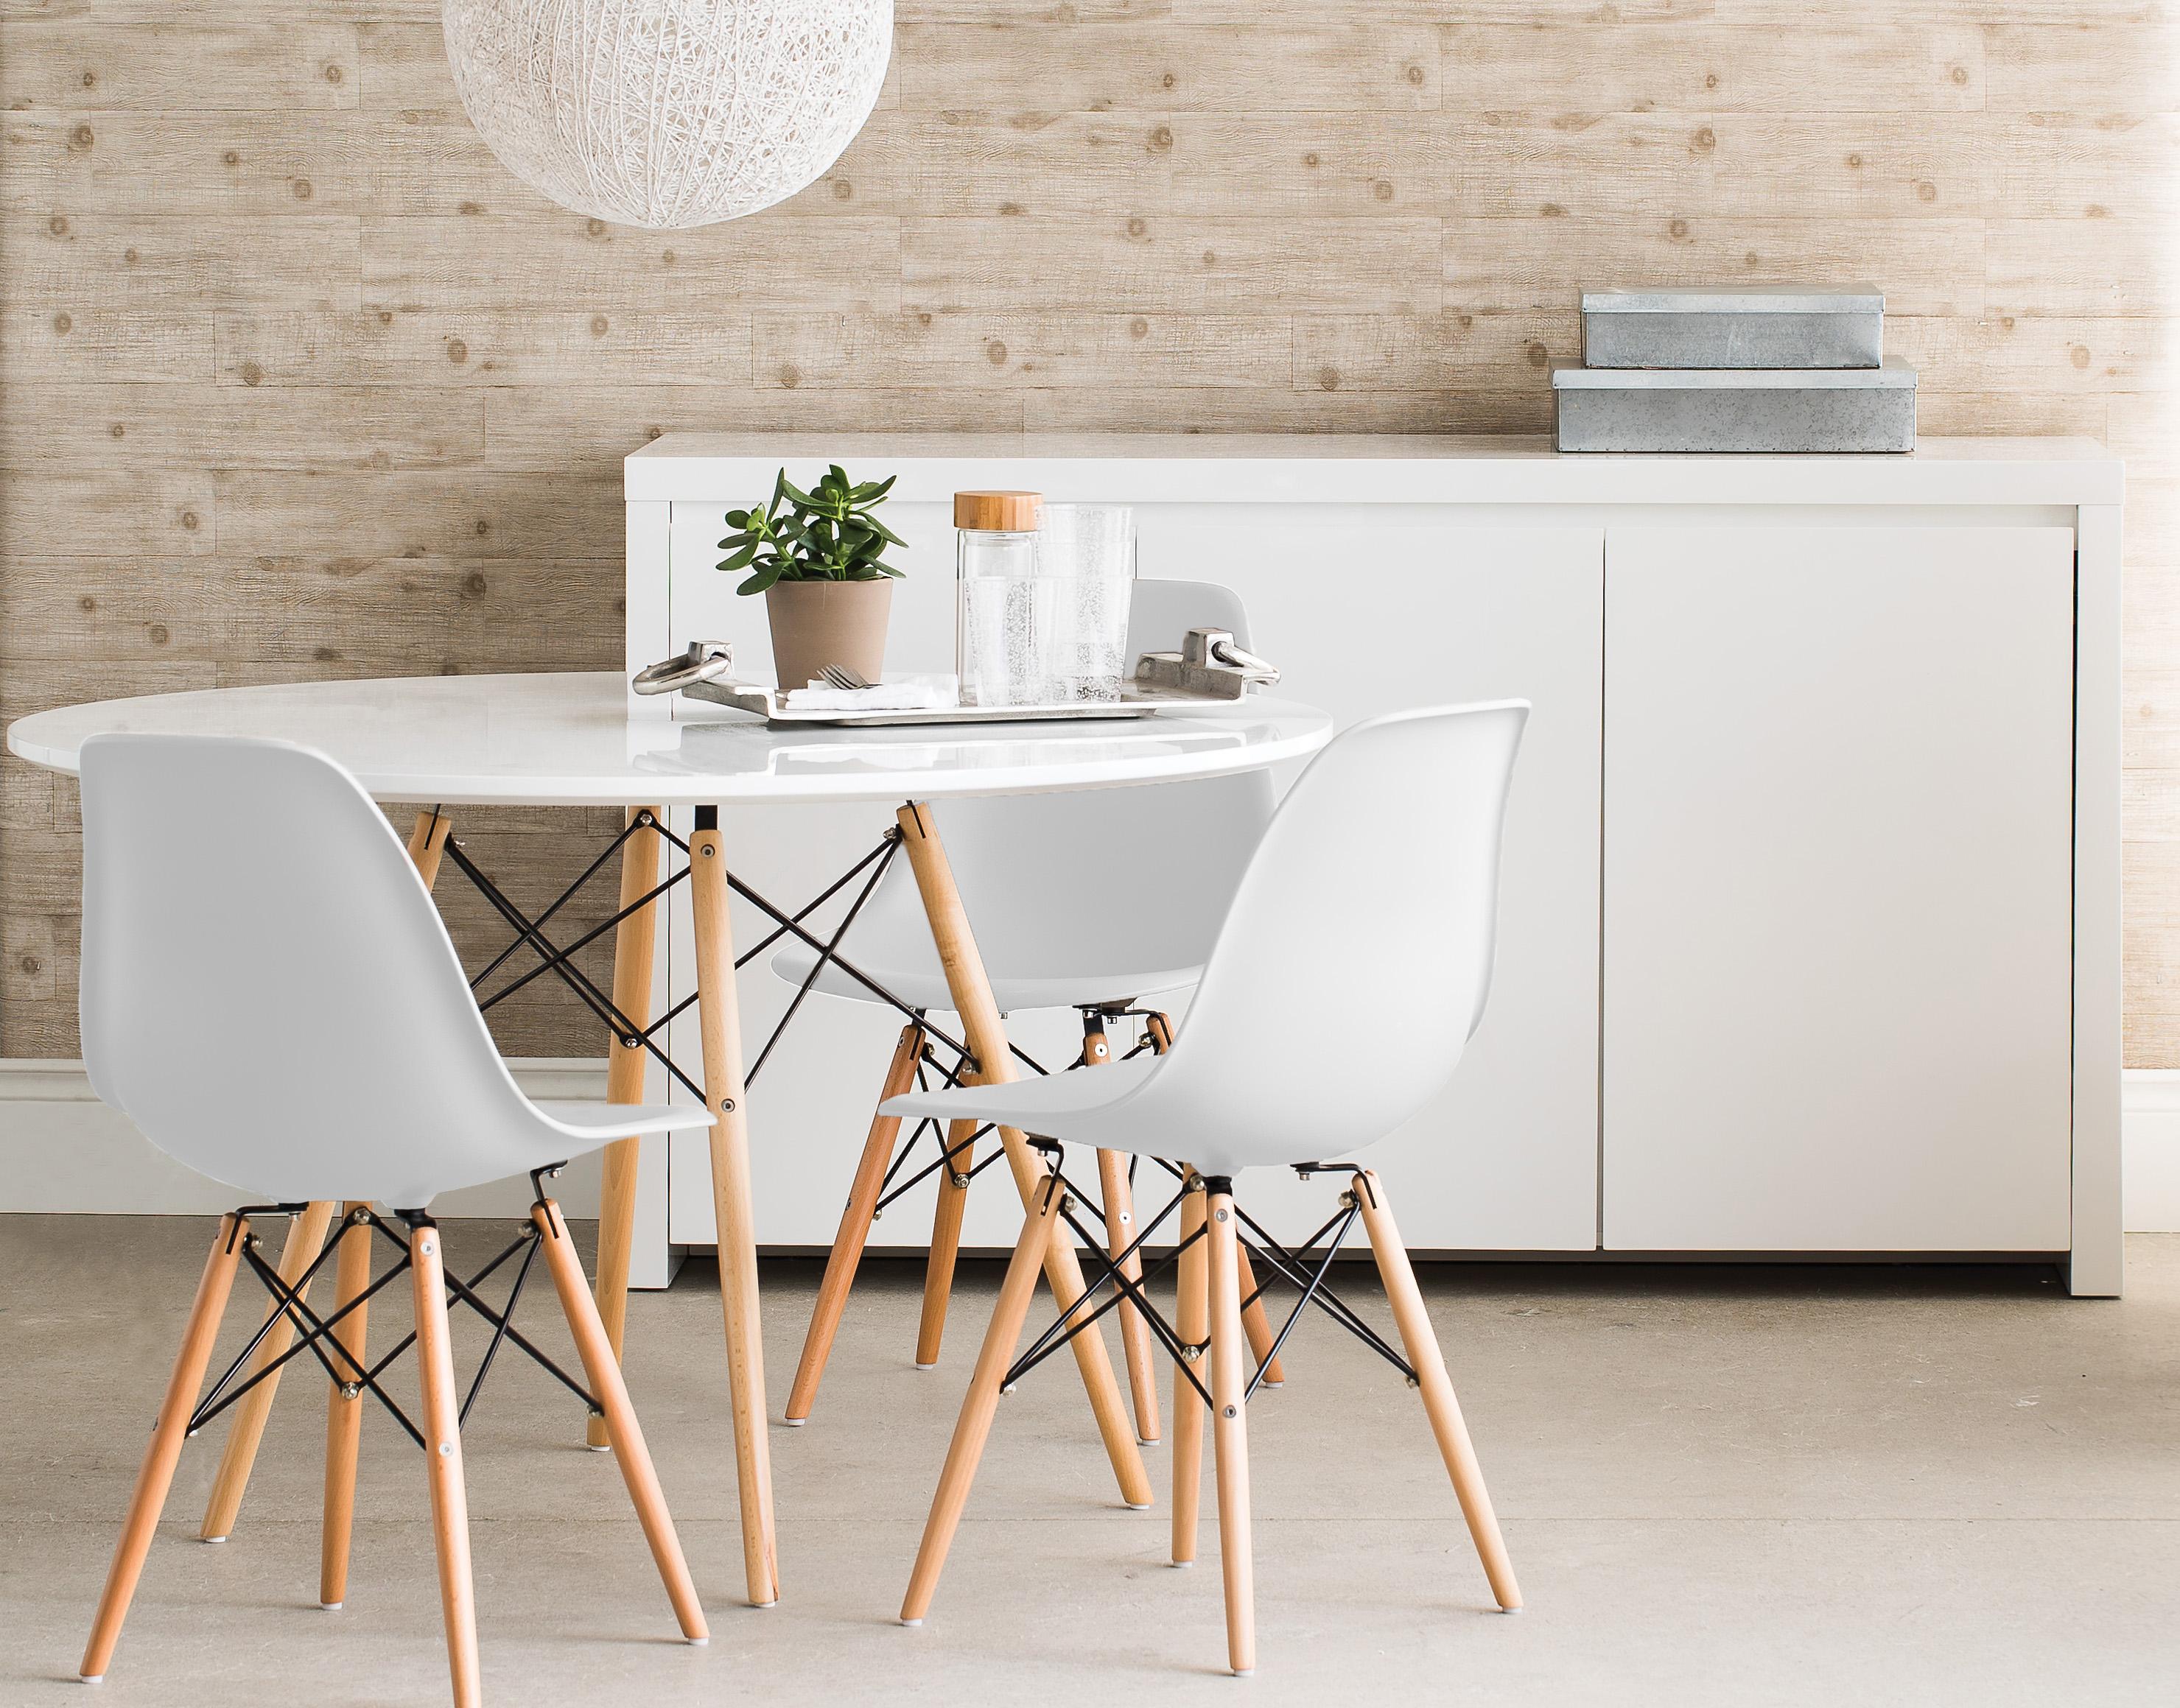 Park Art My WordPress Blog_White Chair With Wooden Legs Ikea